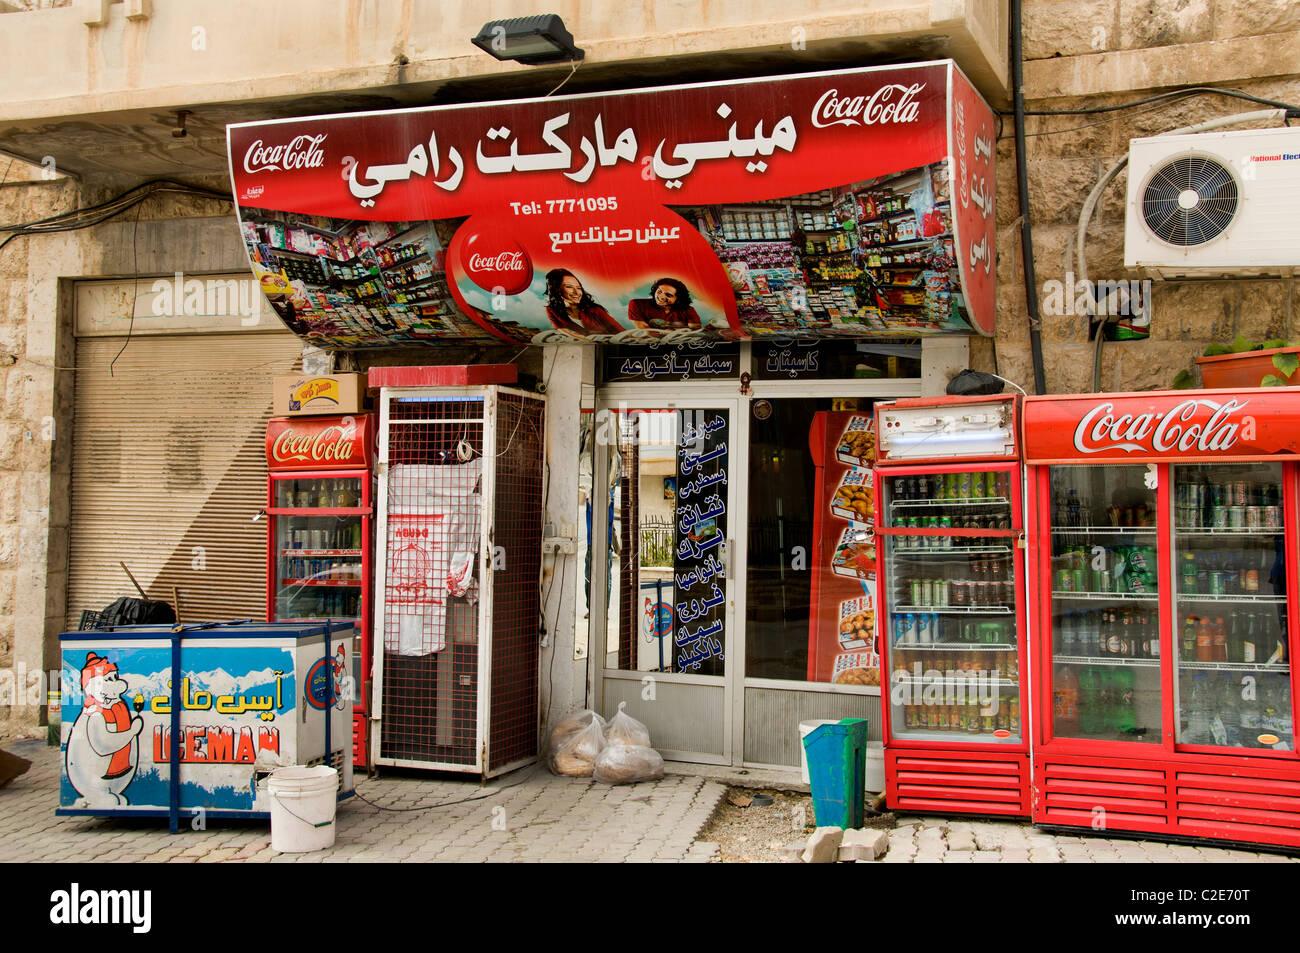 Maalula coca cola fast food Syria town Syrian Bar - Stock Image